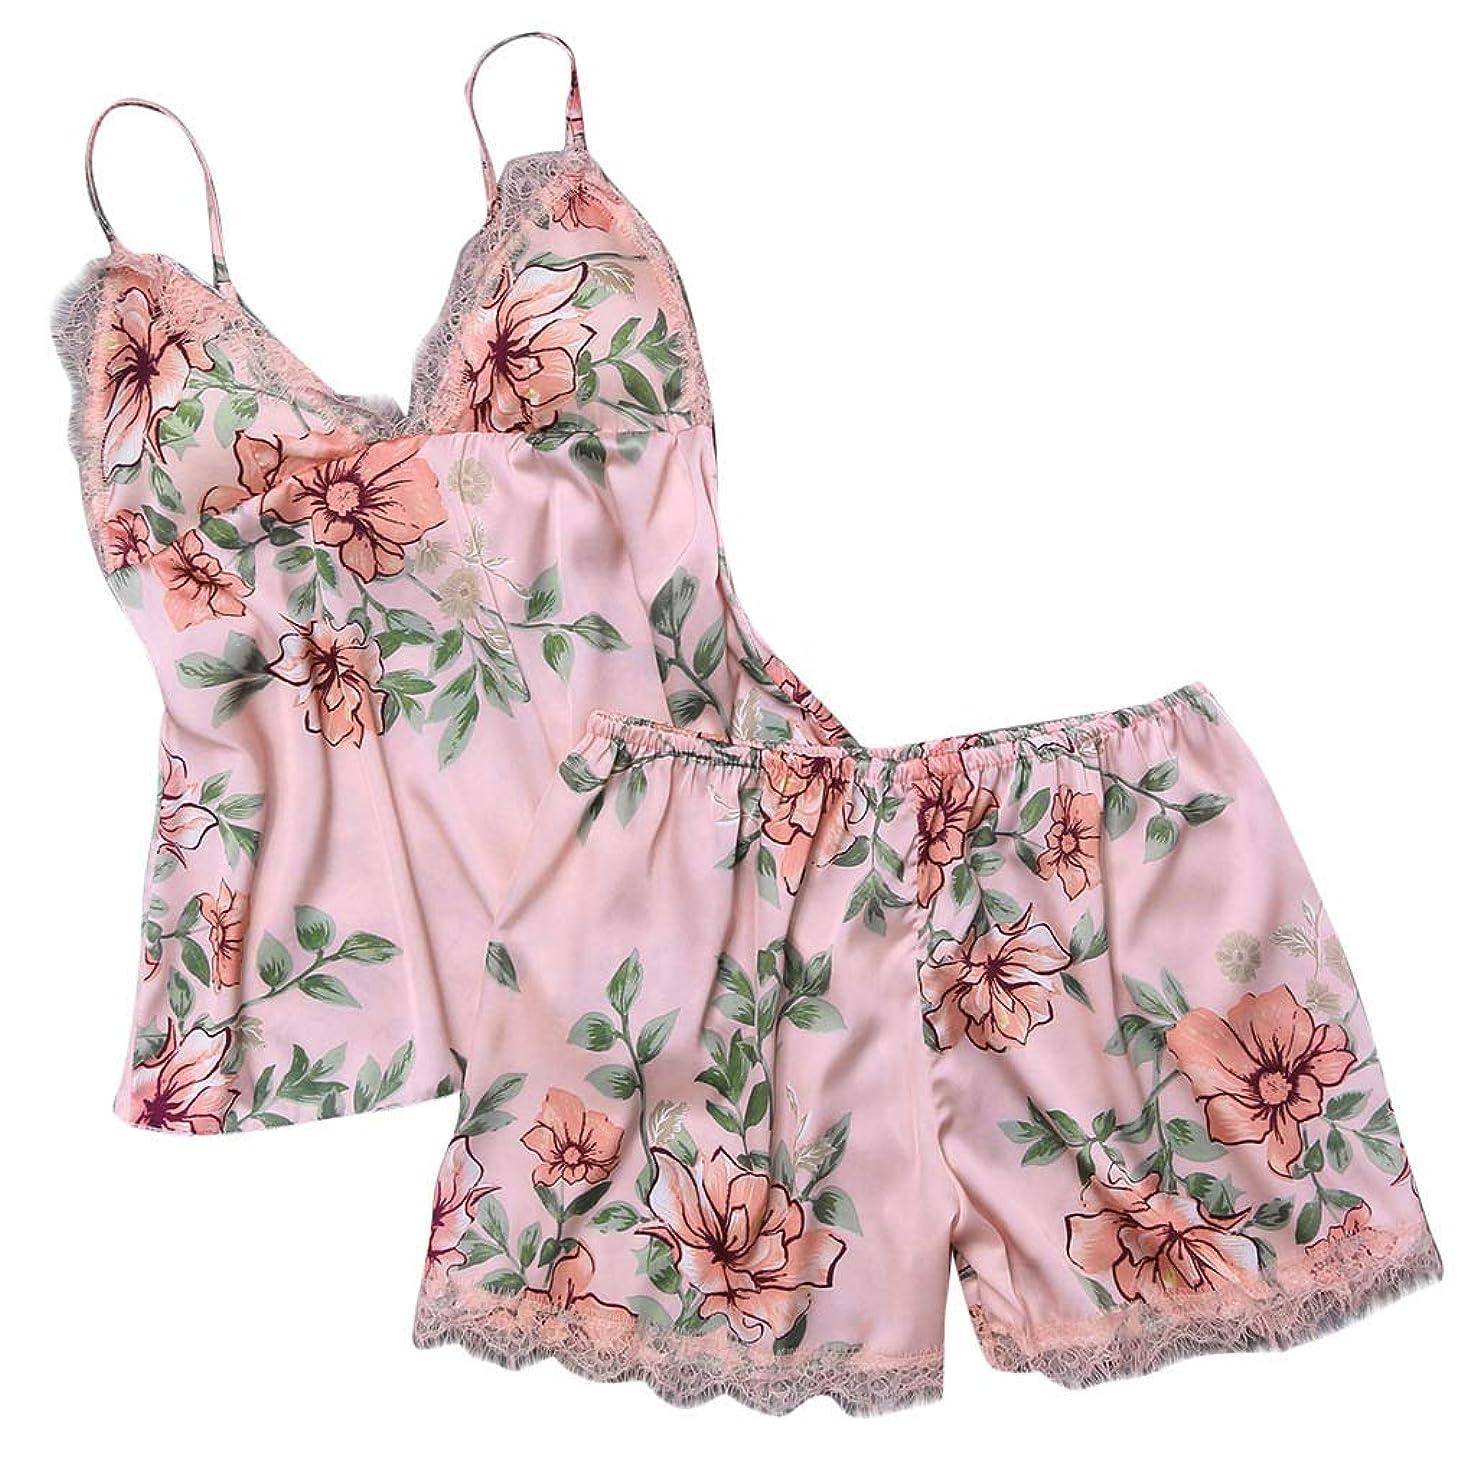 Women's Flower Lace Satin Sleepwear Plus Size V Neck Cami Top and Shorts Pajama Set Nighty Set